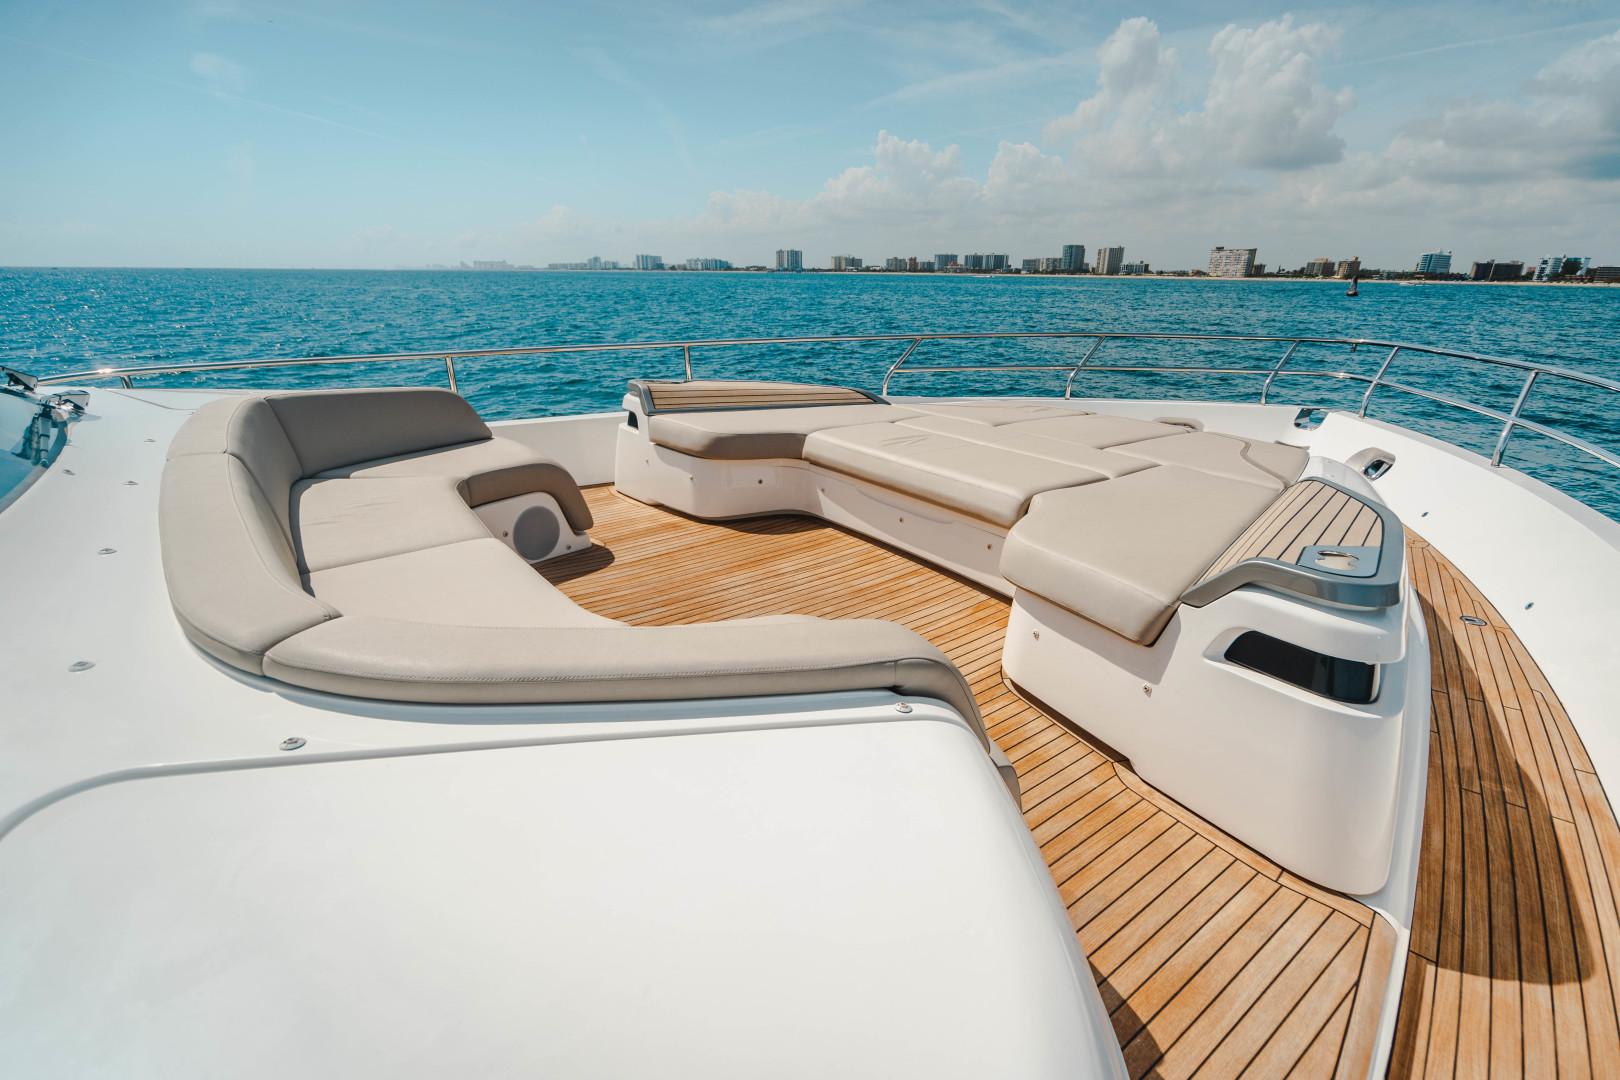 Princess-Y85  2019-Splash Delray Beach-Florida-United States-1631624 | Thumbnail